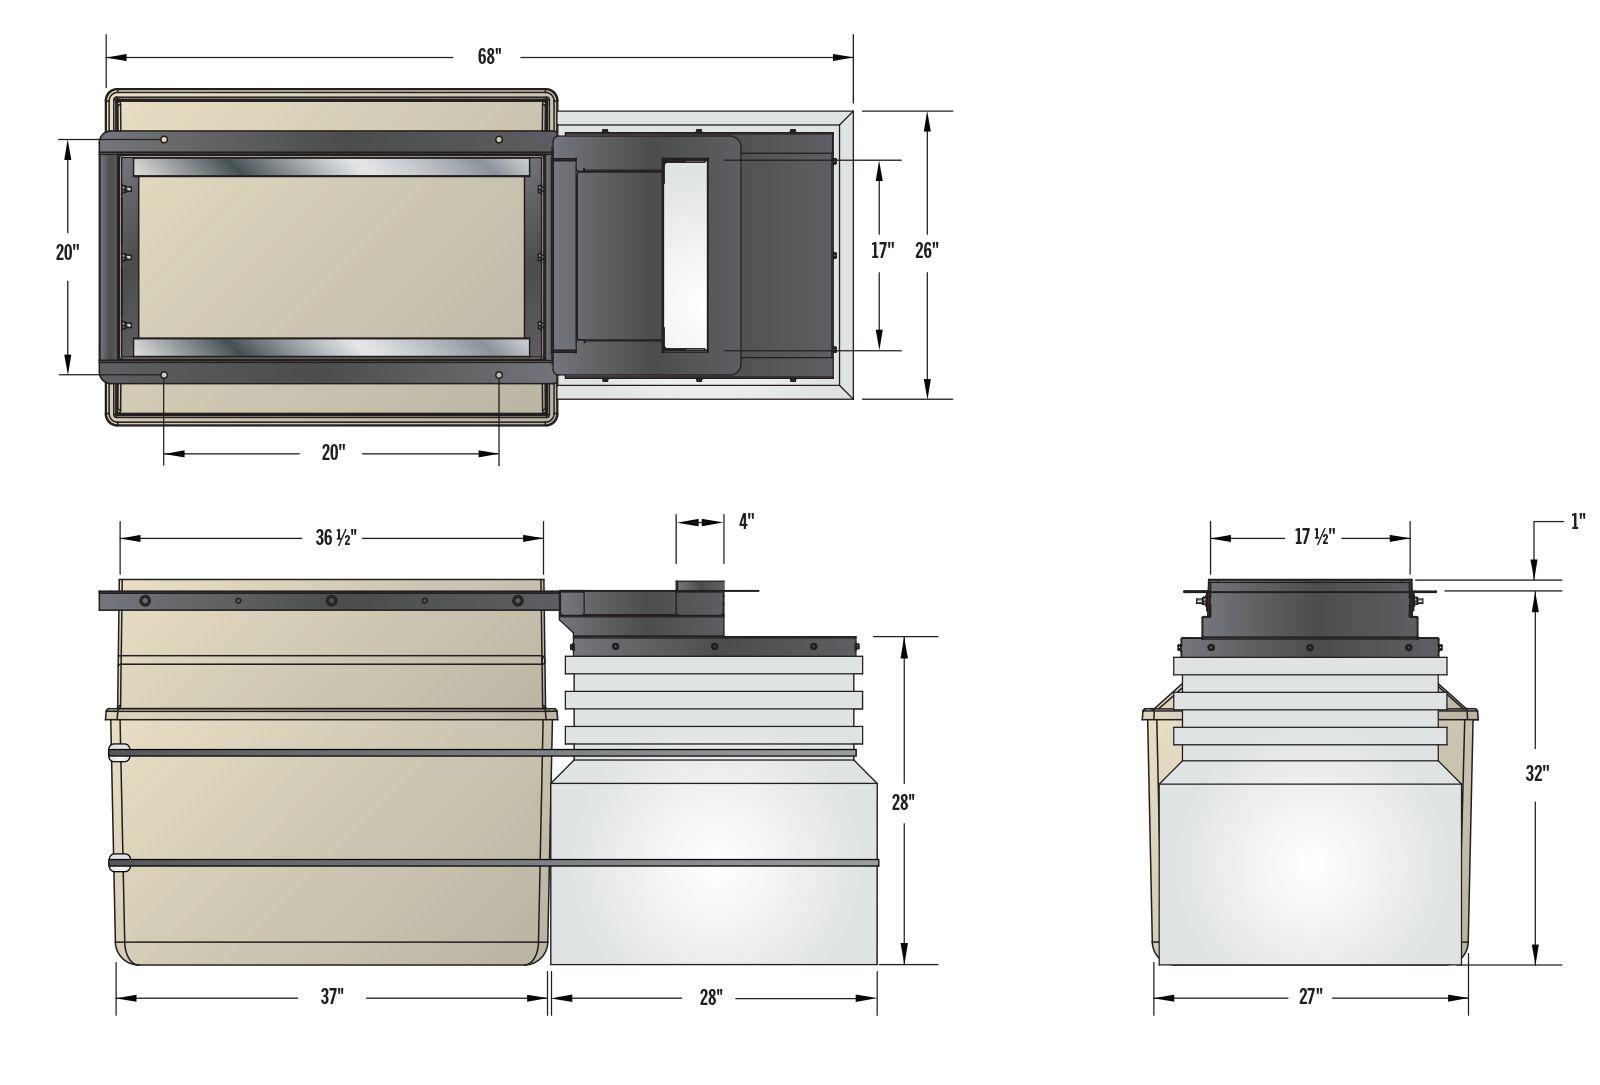 Low Profile Dispenser Sump w DEF - Dims.psd